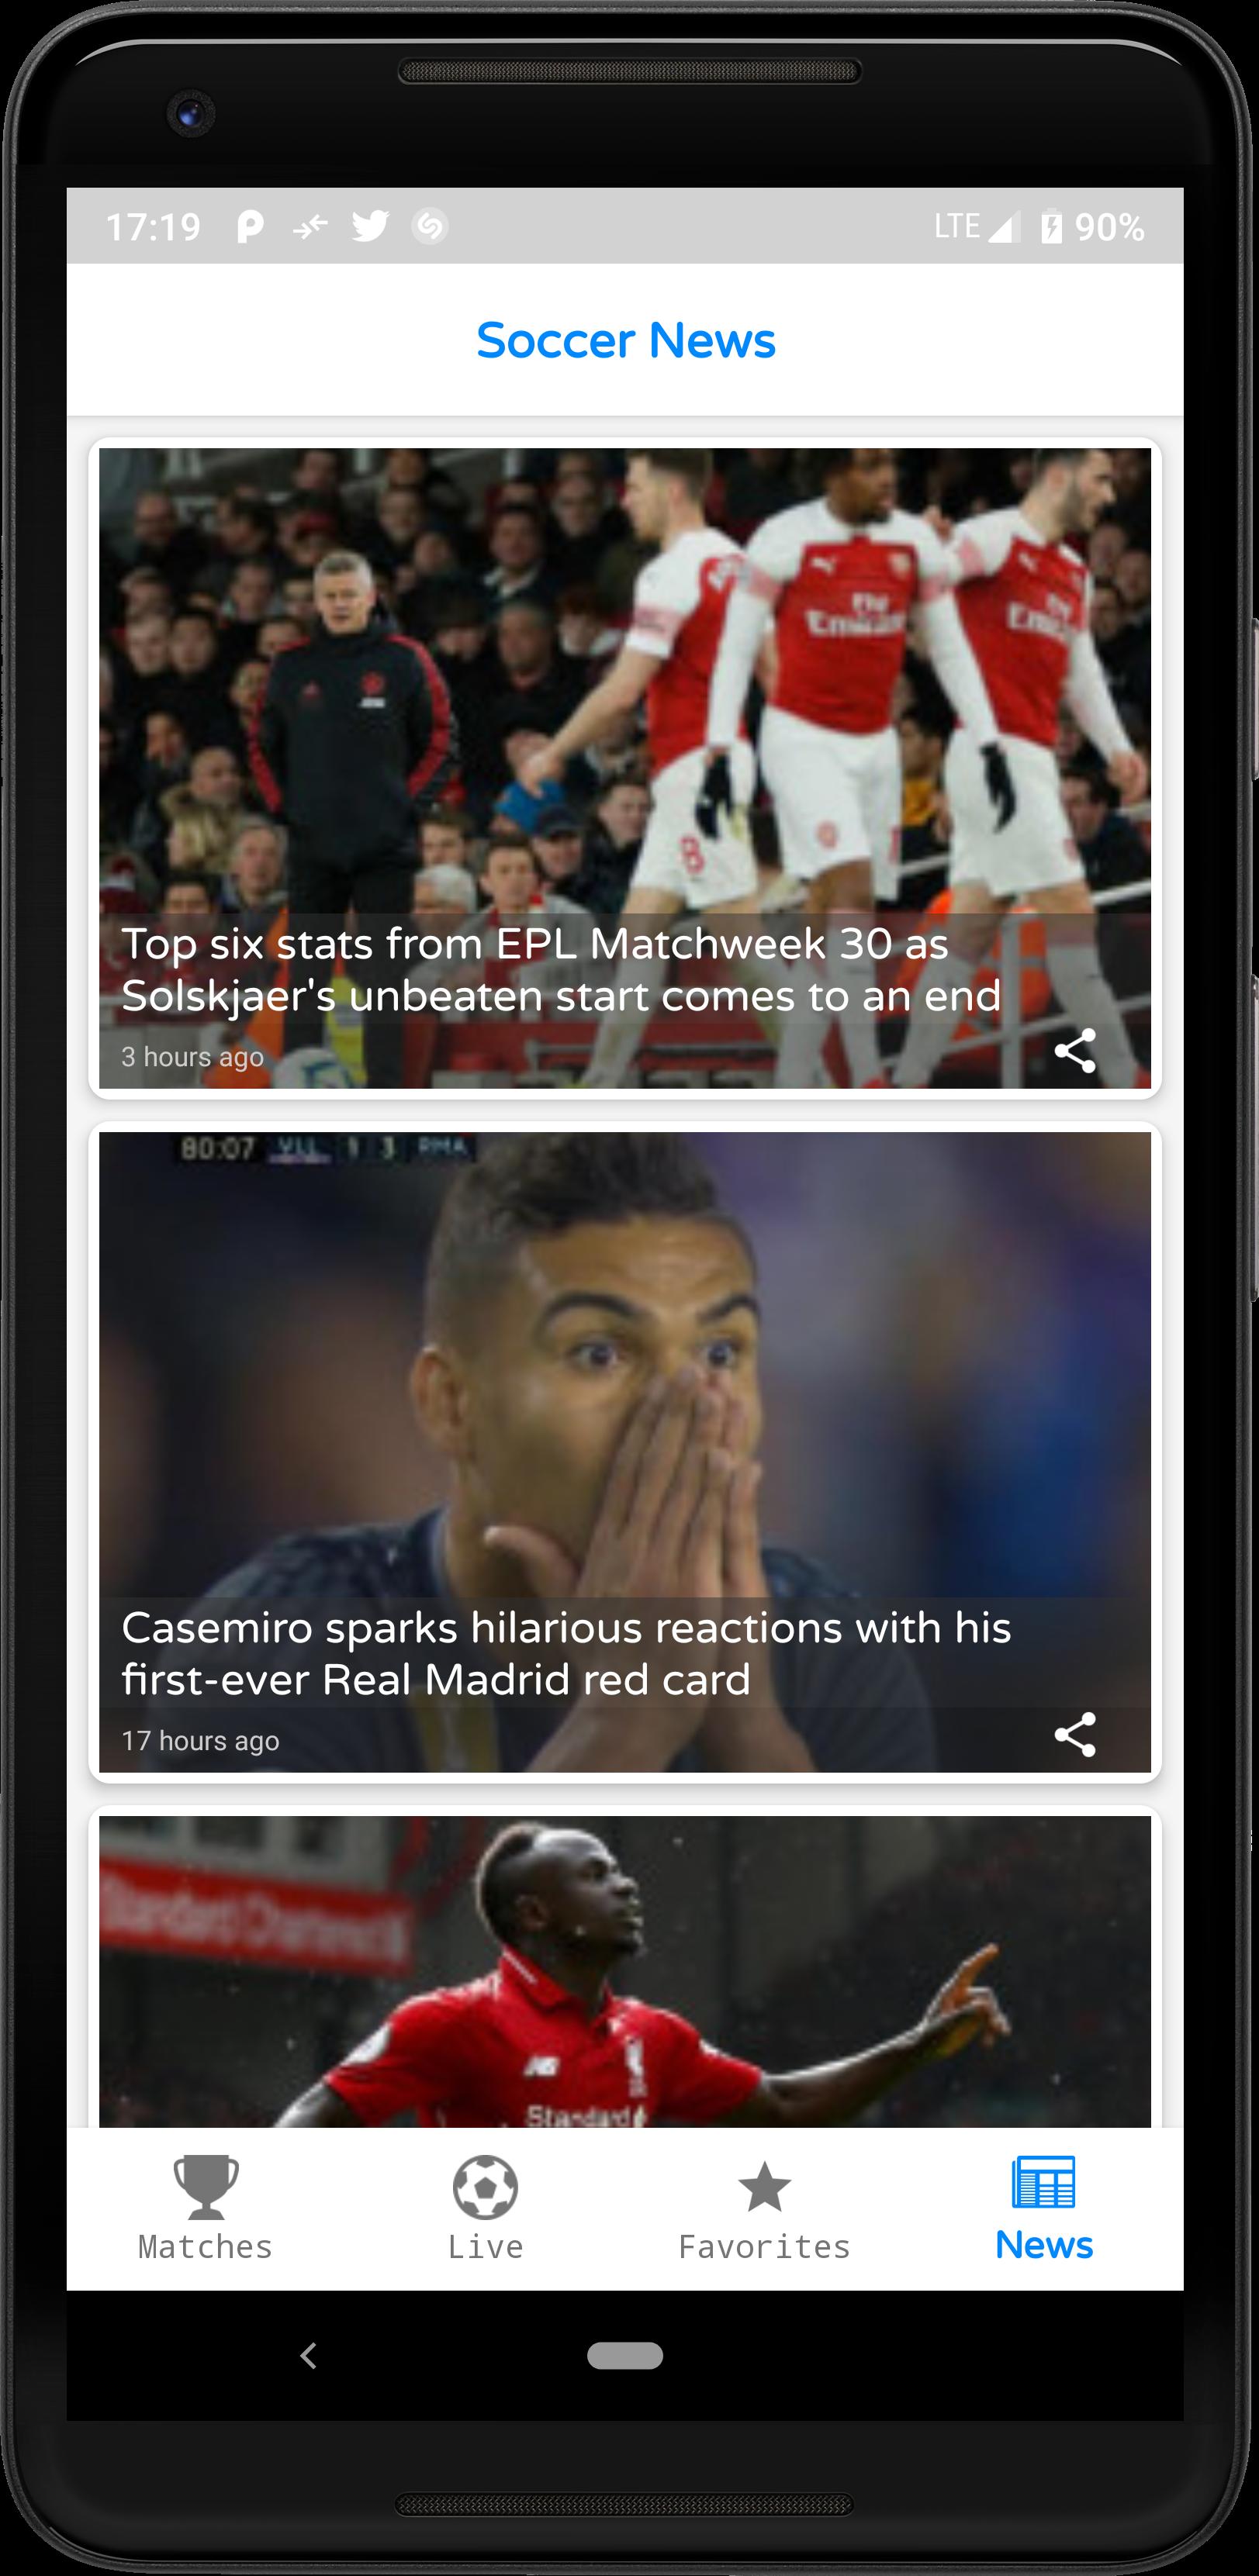 LiveScore - Football Android Full App (Admob)